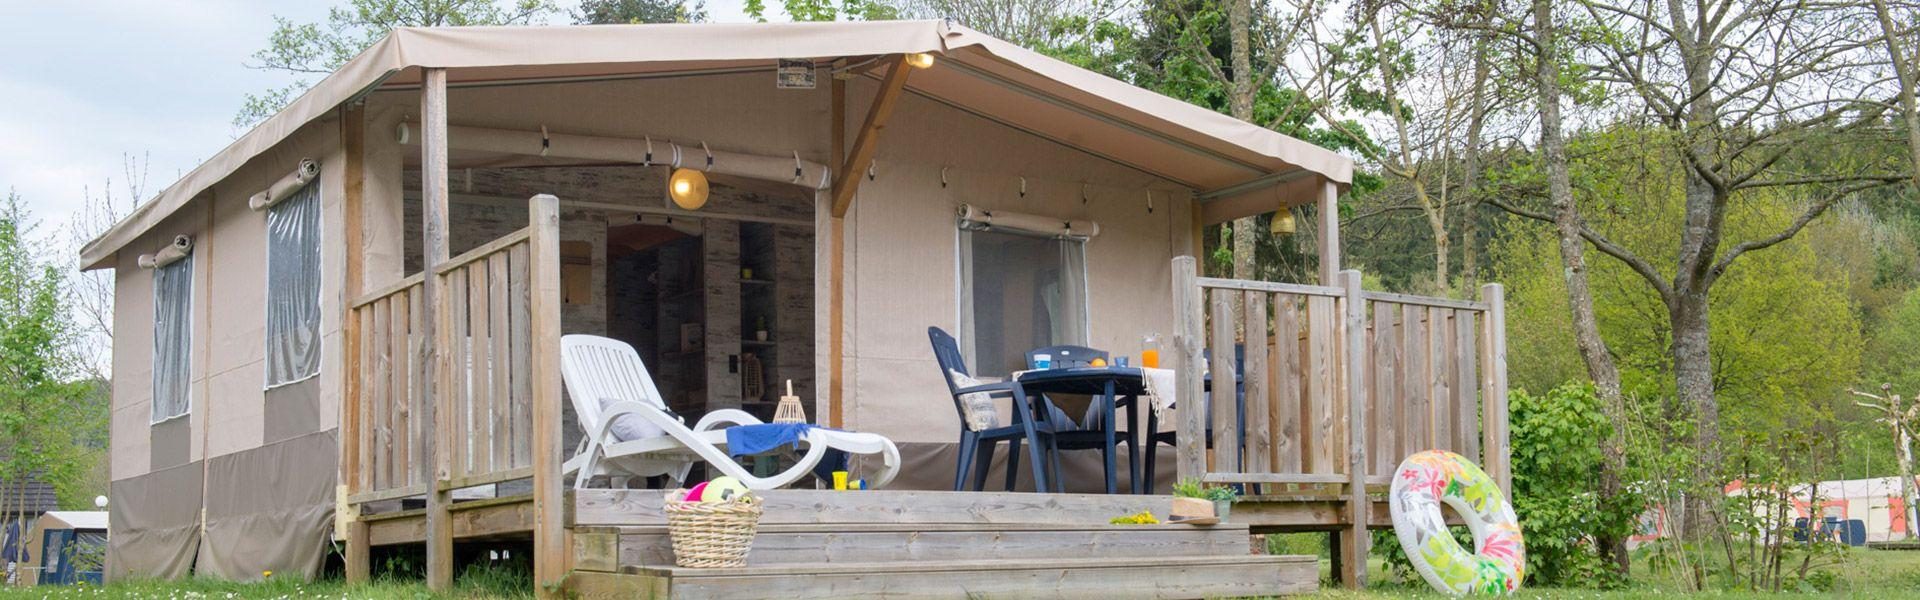 Camping Tentes meublées